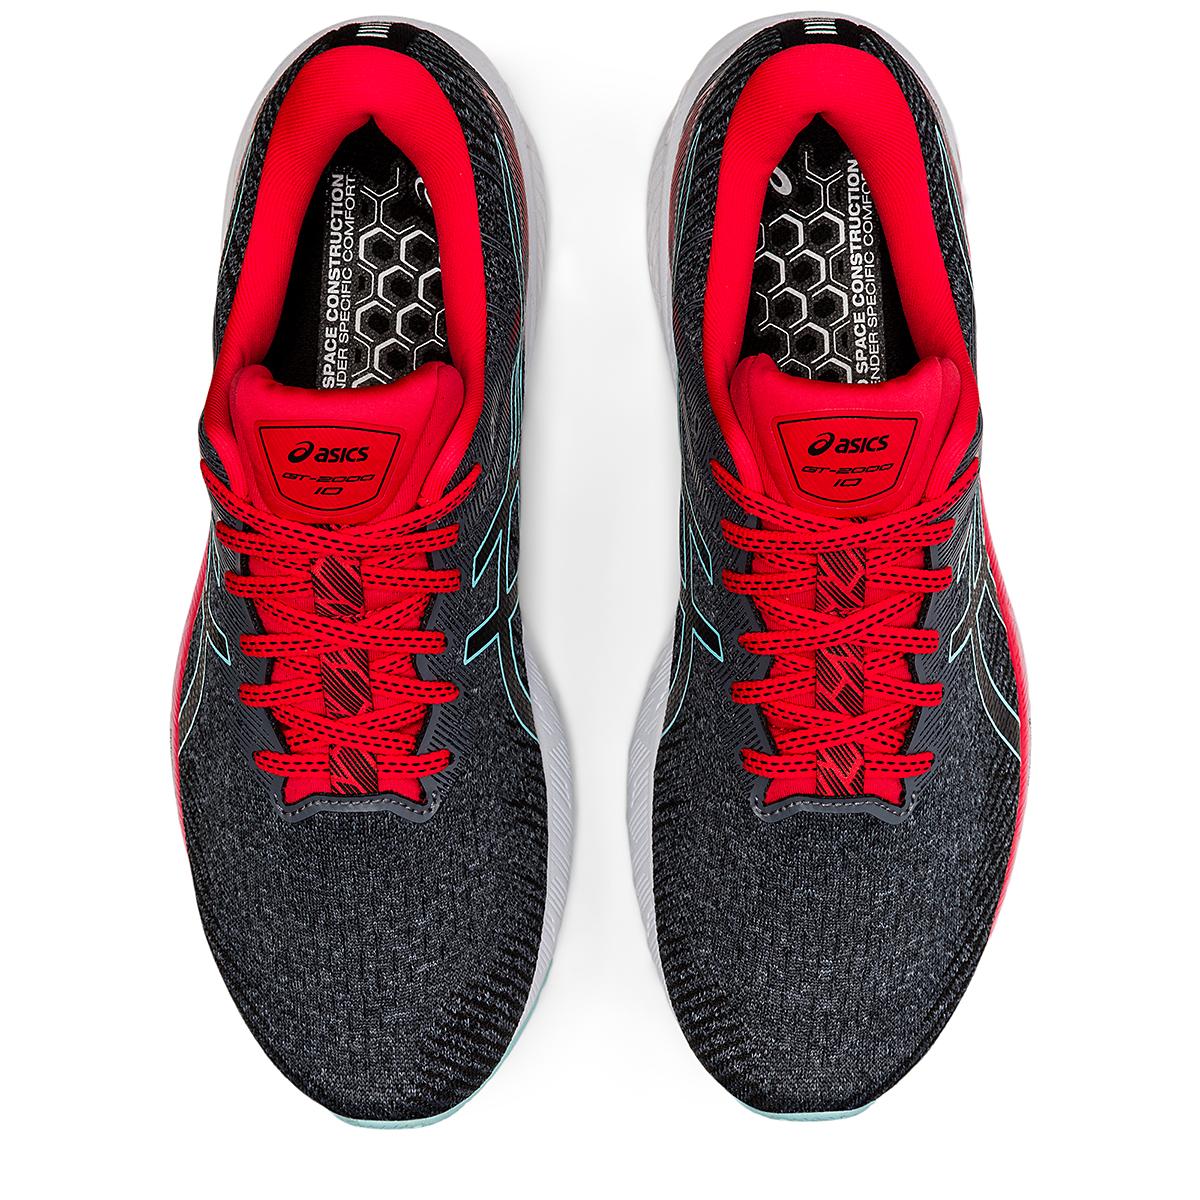 Men's Asics GT-2000 10 Running Shoe - Color: Metropolis/Electric Red - Size: 7 - Width: Regular, Metropolis/Electric Red, large, image 6